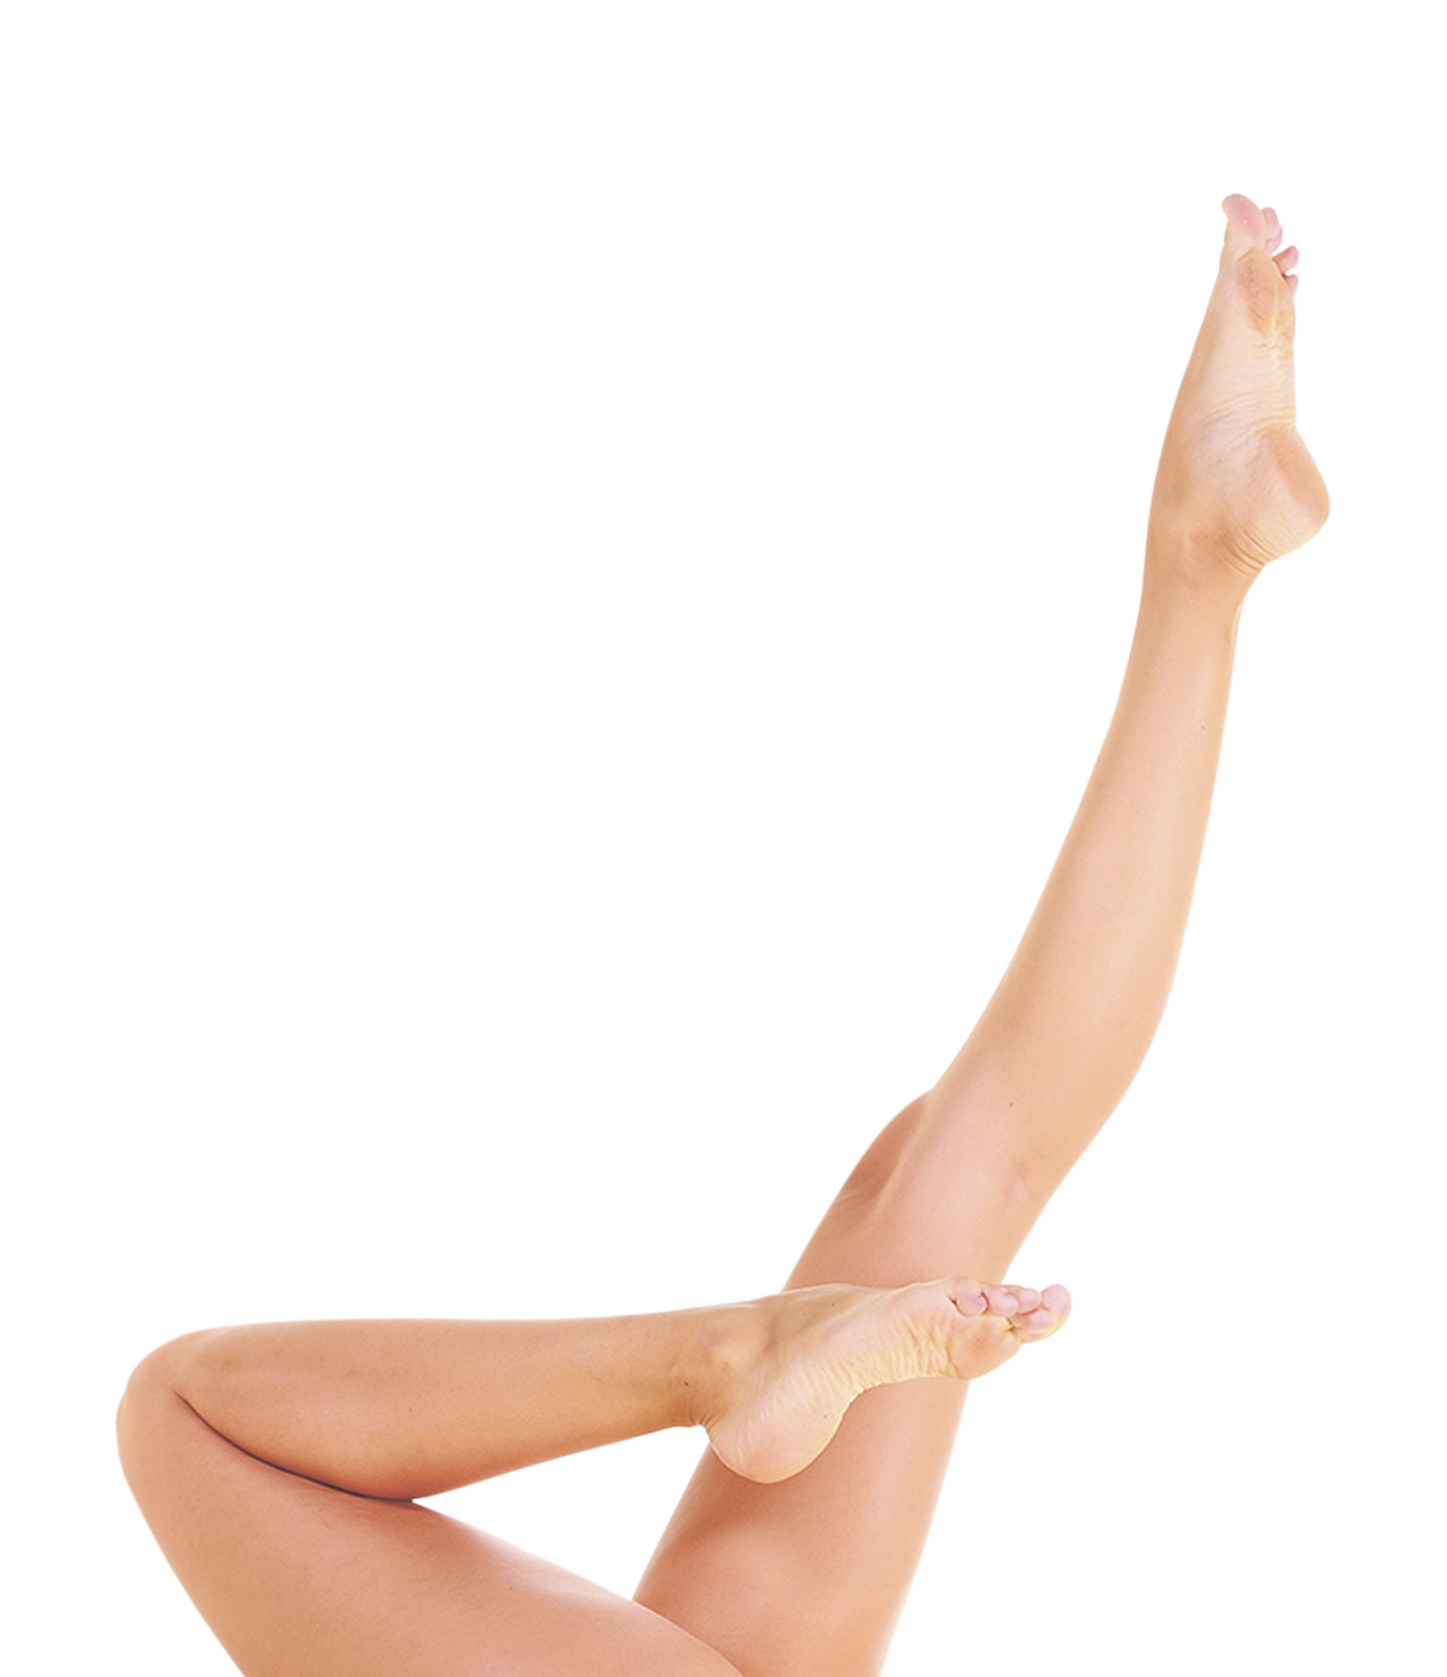 Women legs PNG image